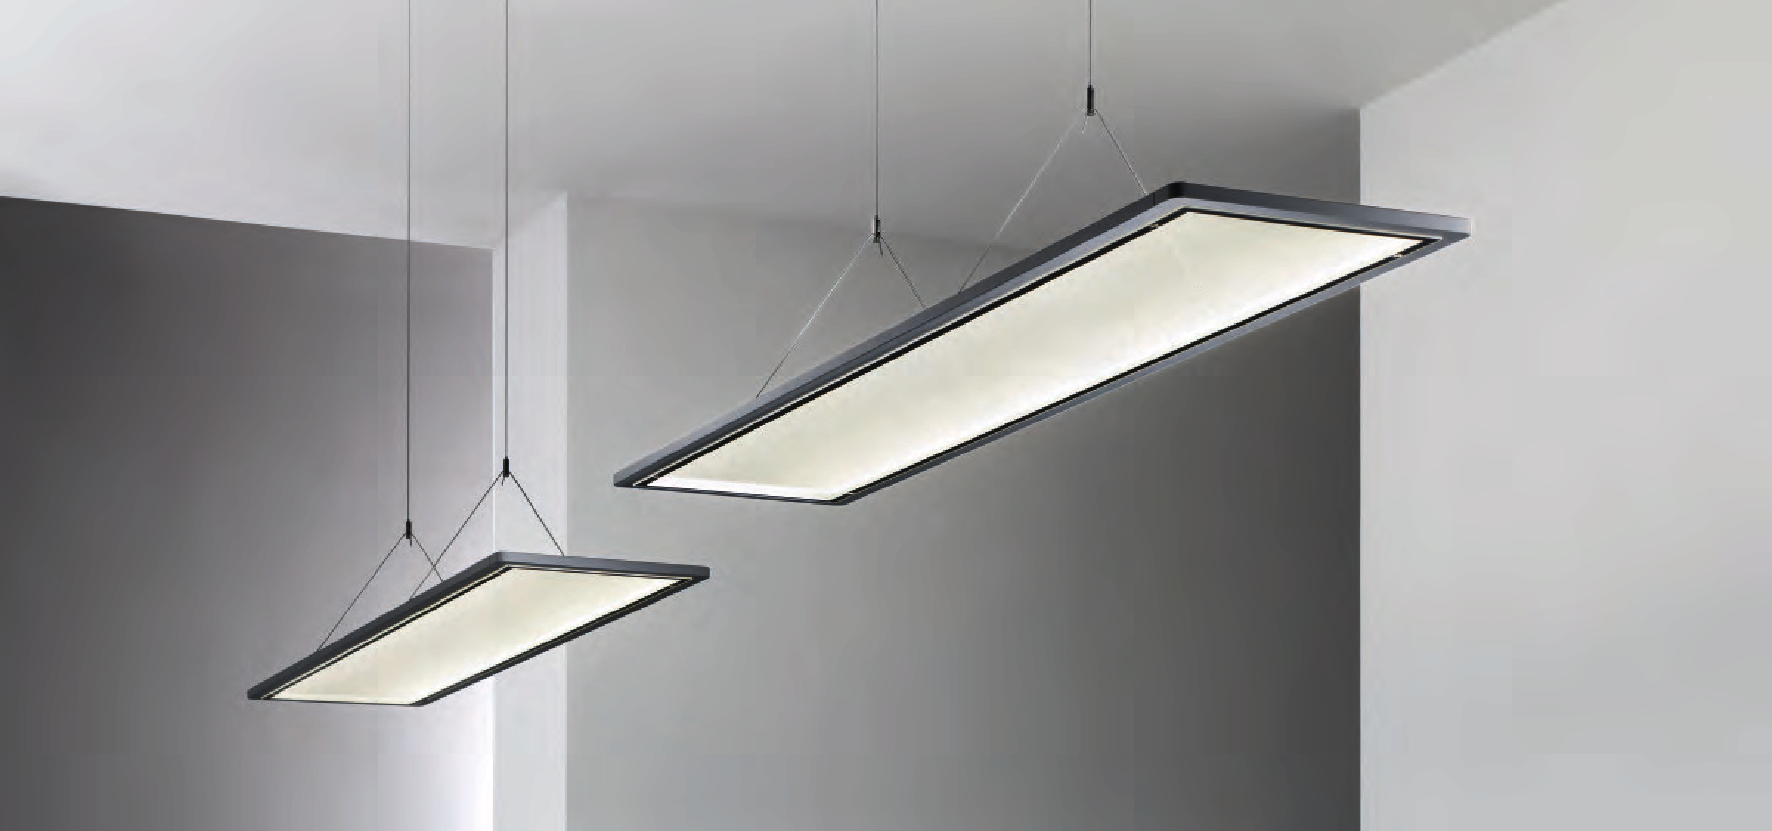 Förderung Led Beleuchtung Österreich | Leuchtentechnik Normung Sicherheitsvorschriften Elektrotechnik